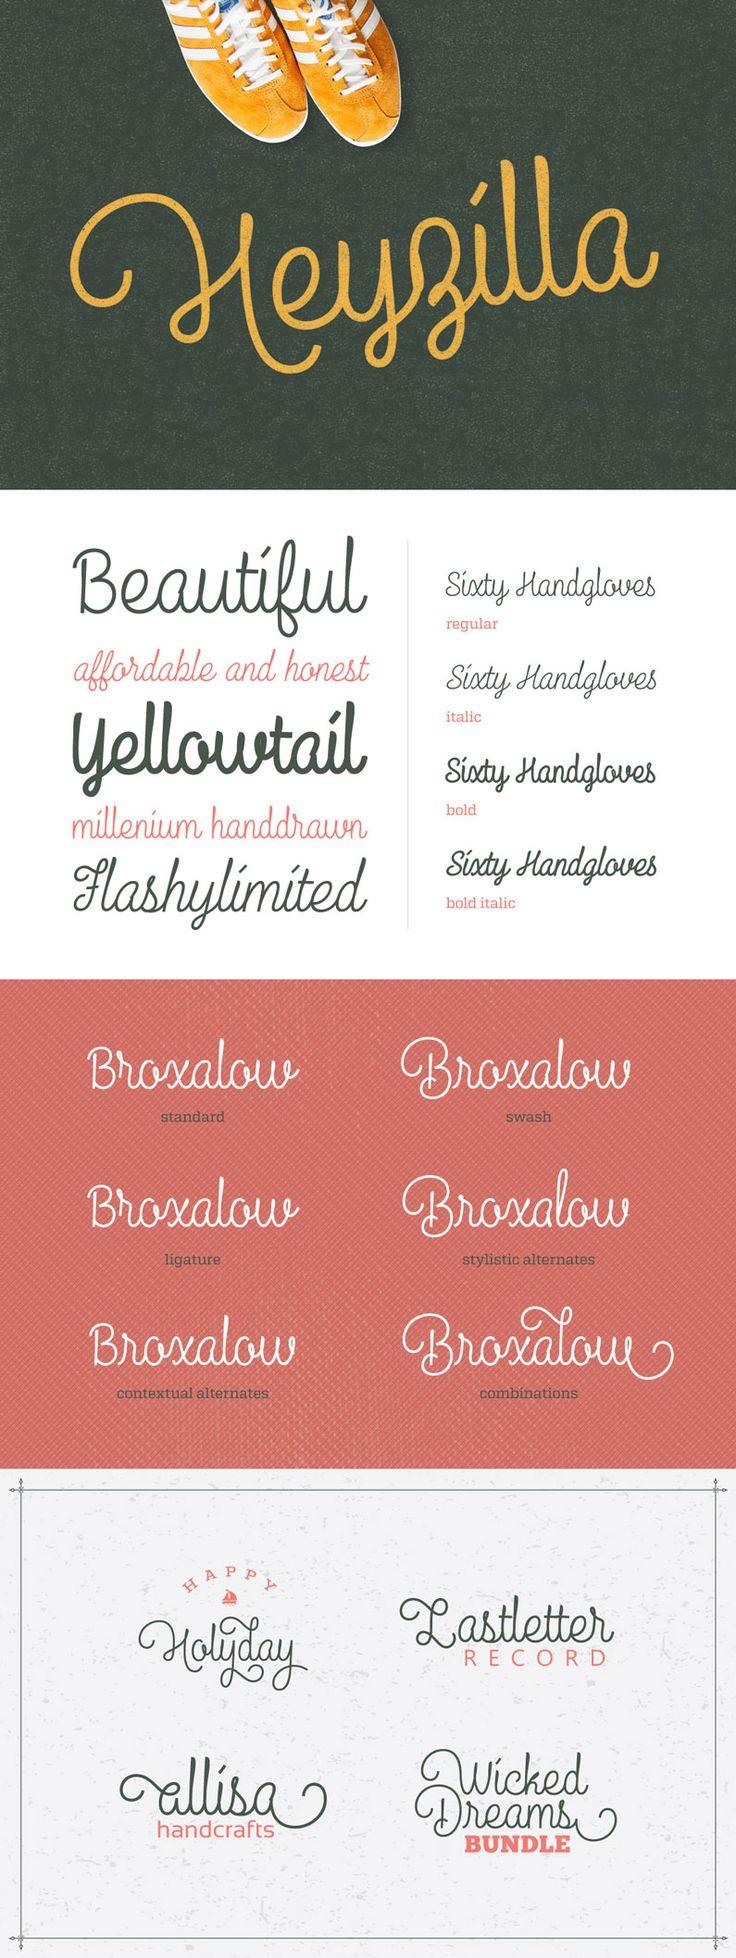 Heyzilla is a multipurpose script font that